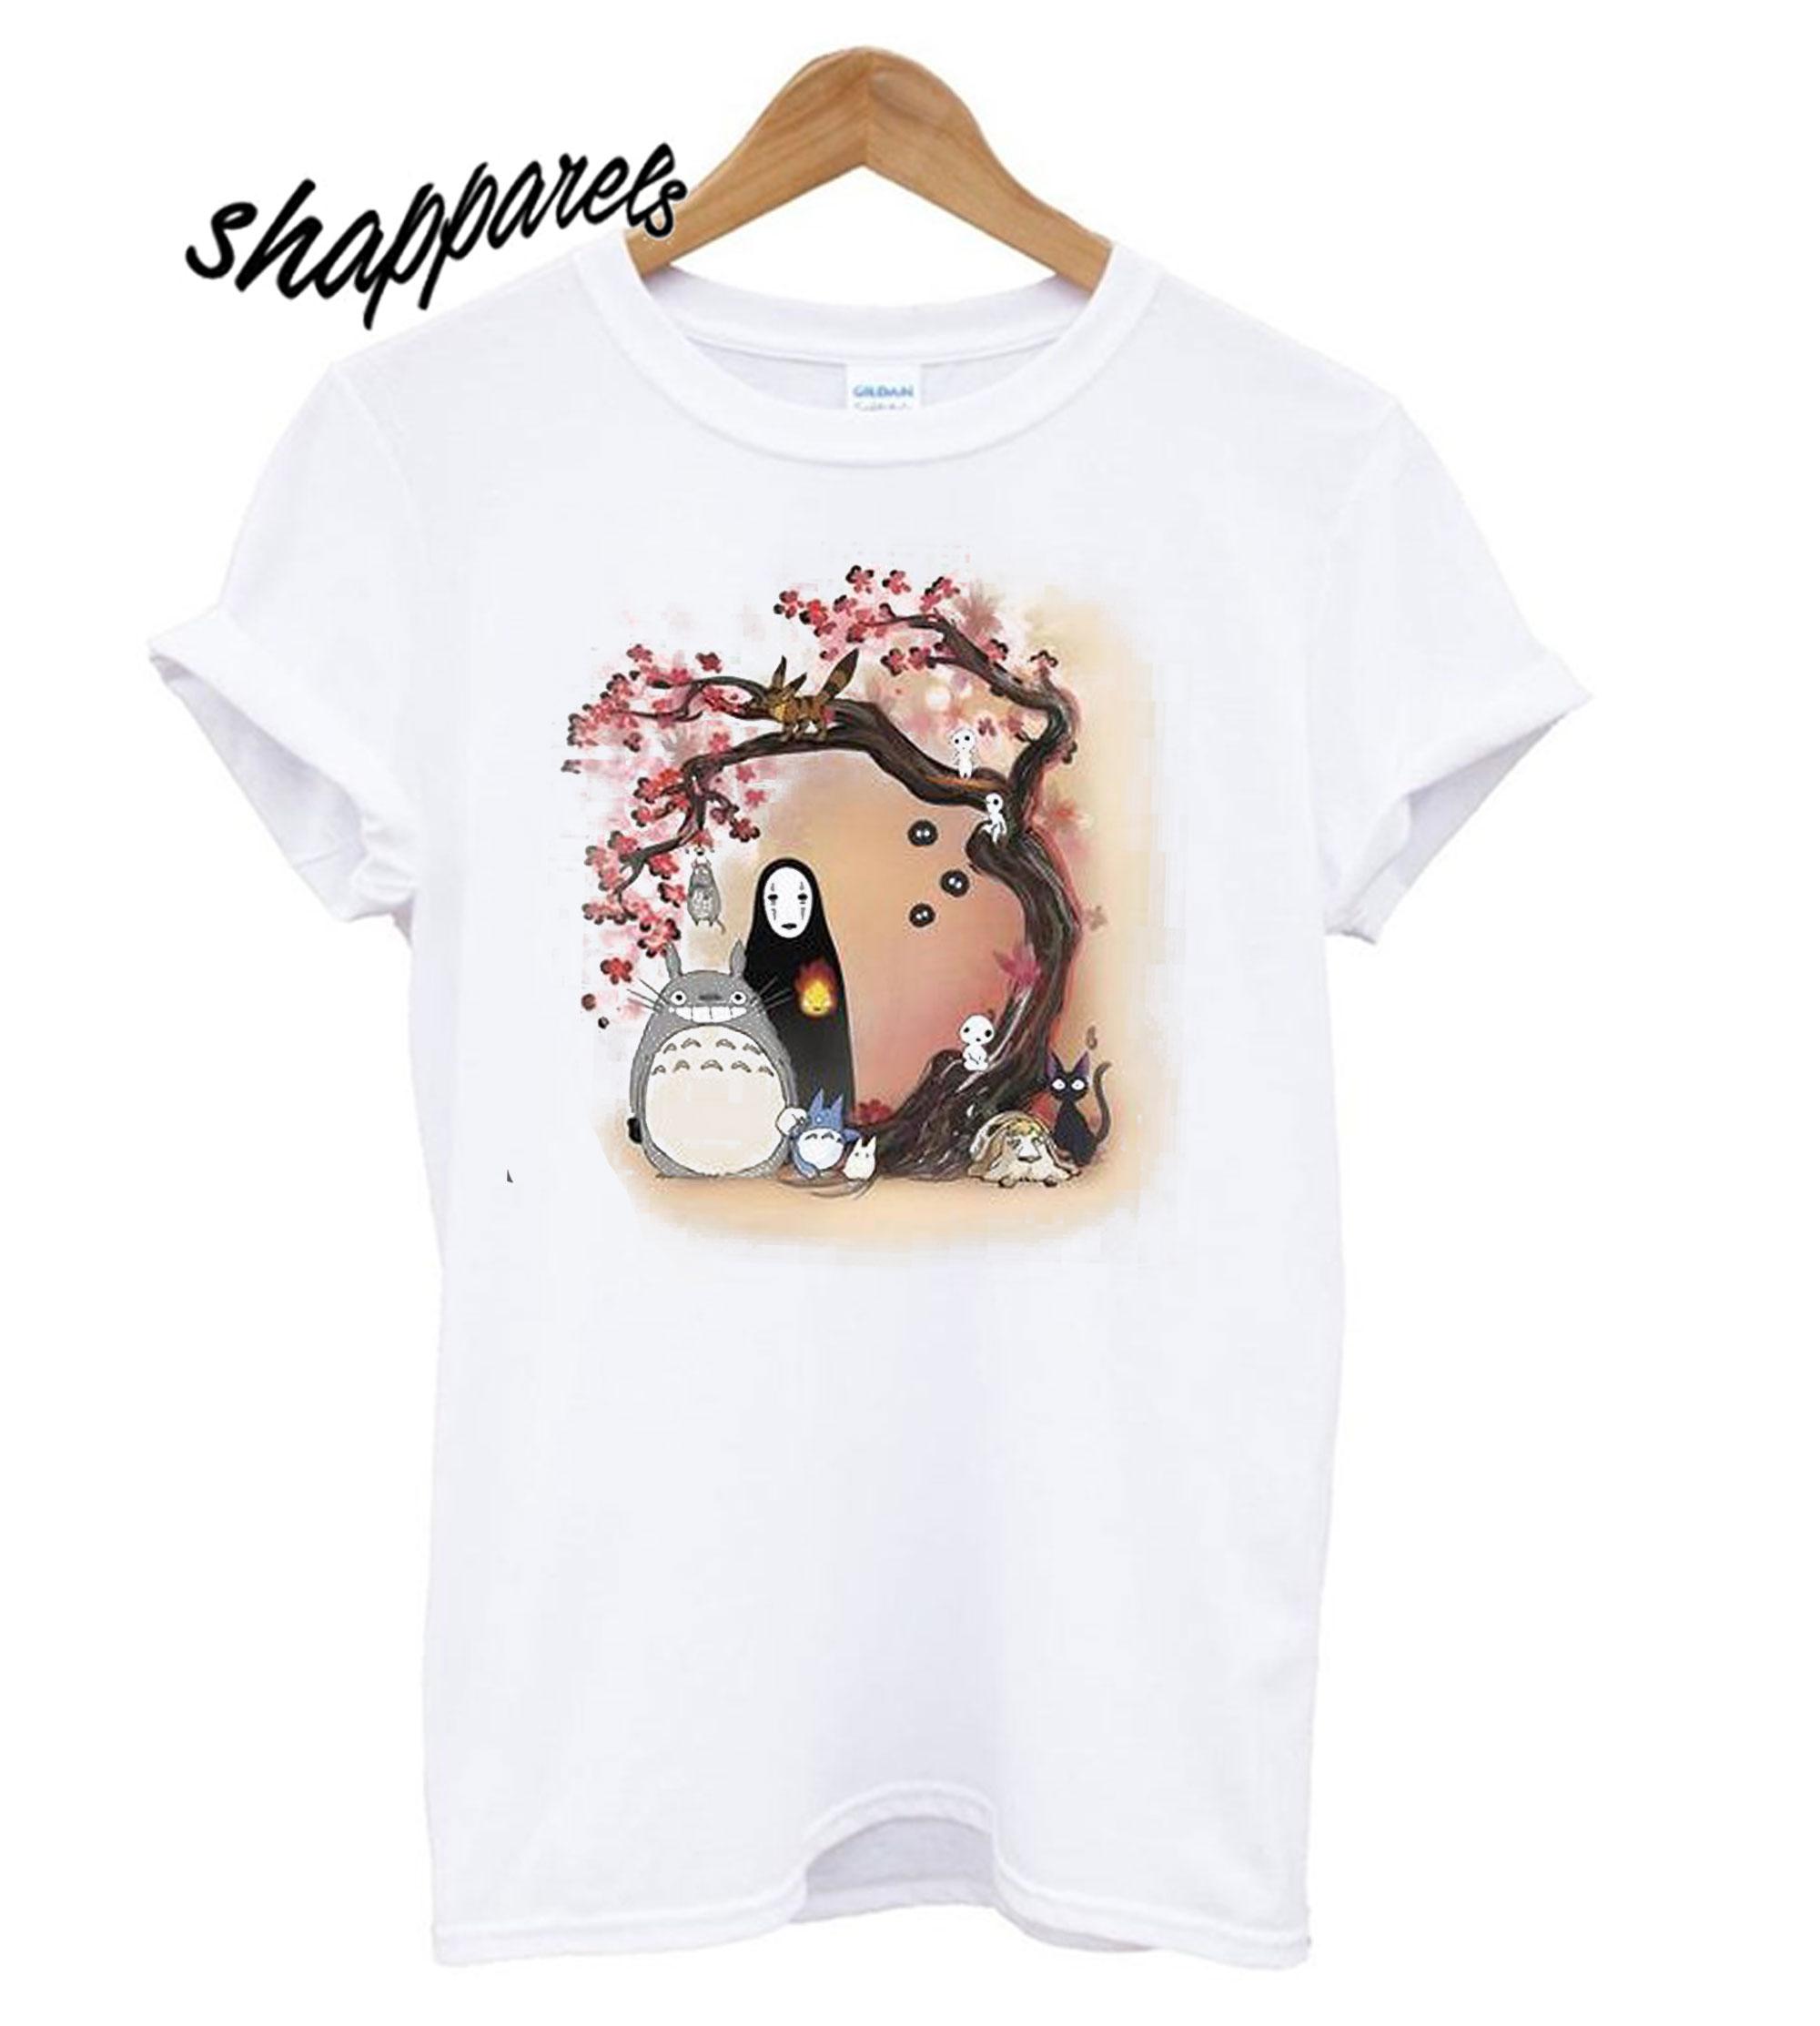 Studio T Scene Totoro Ghibli Character Shirt A35RjL4